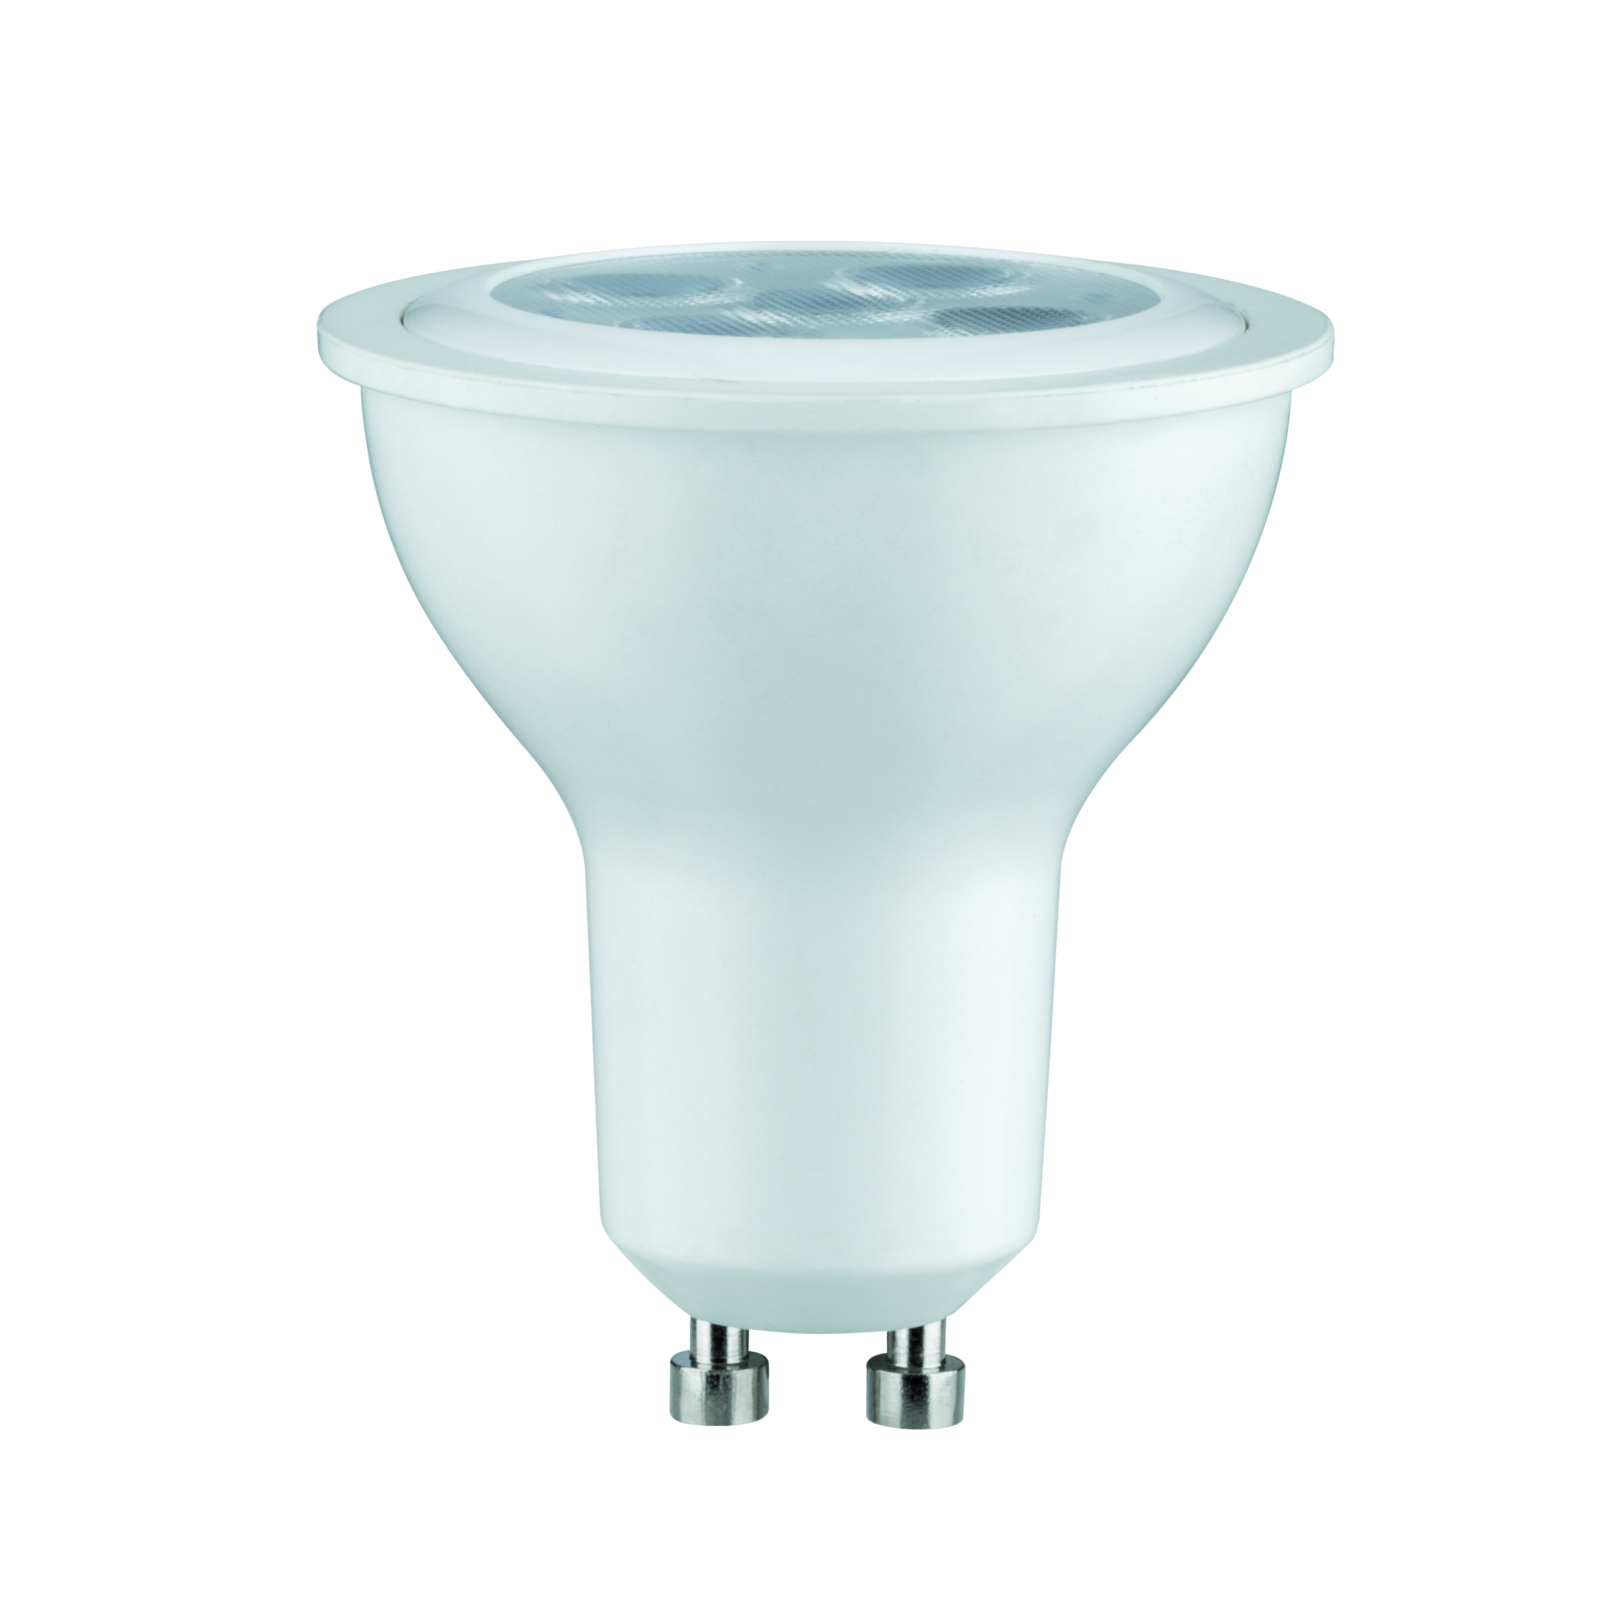 Paulmann LED-Reflektor Teen 5 W - weiß & dimmbar